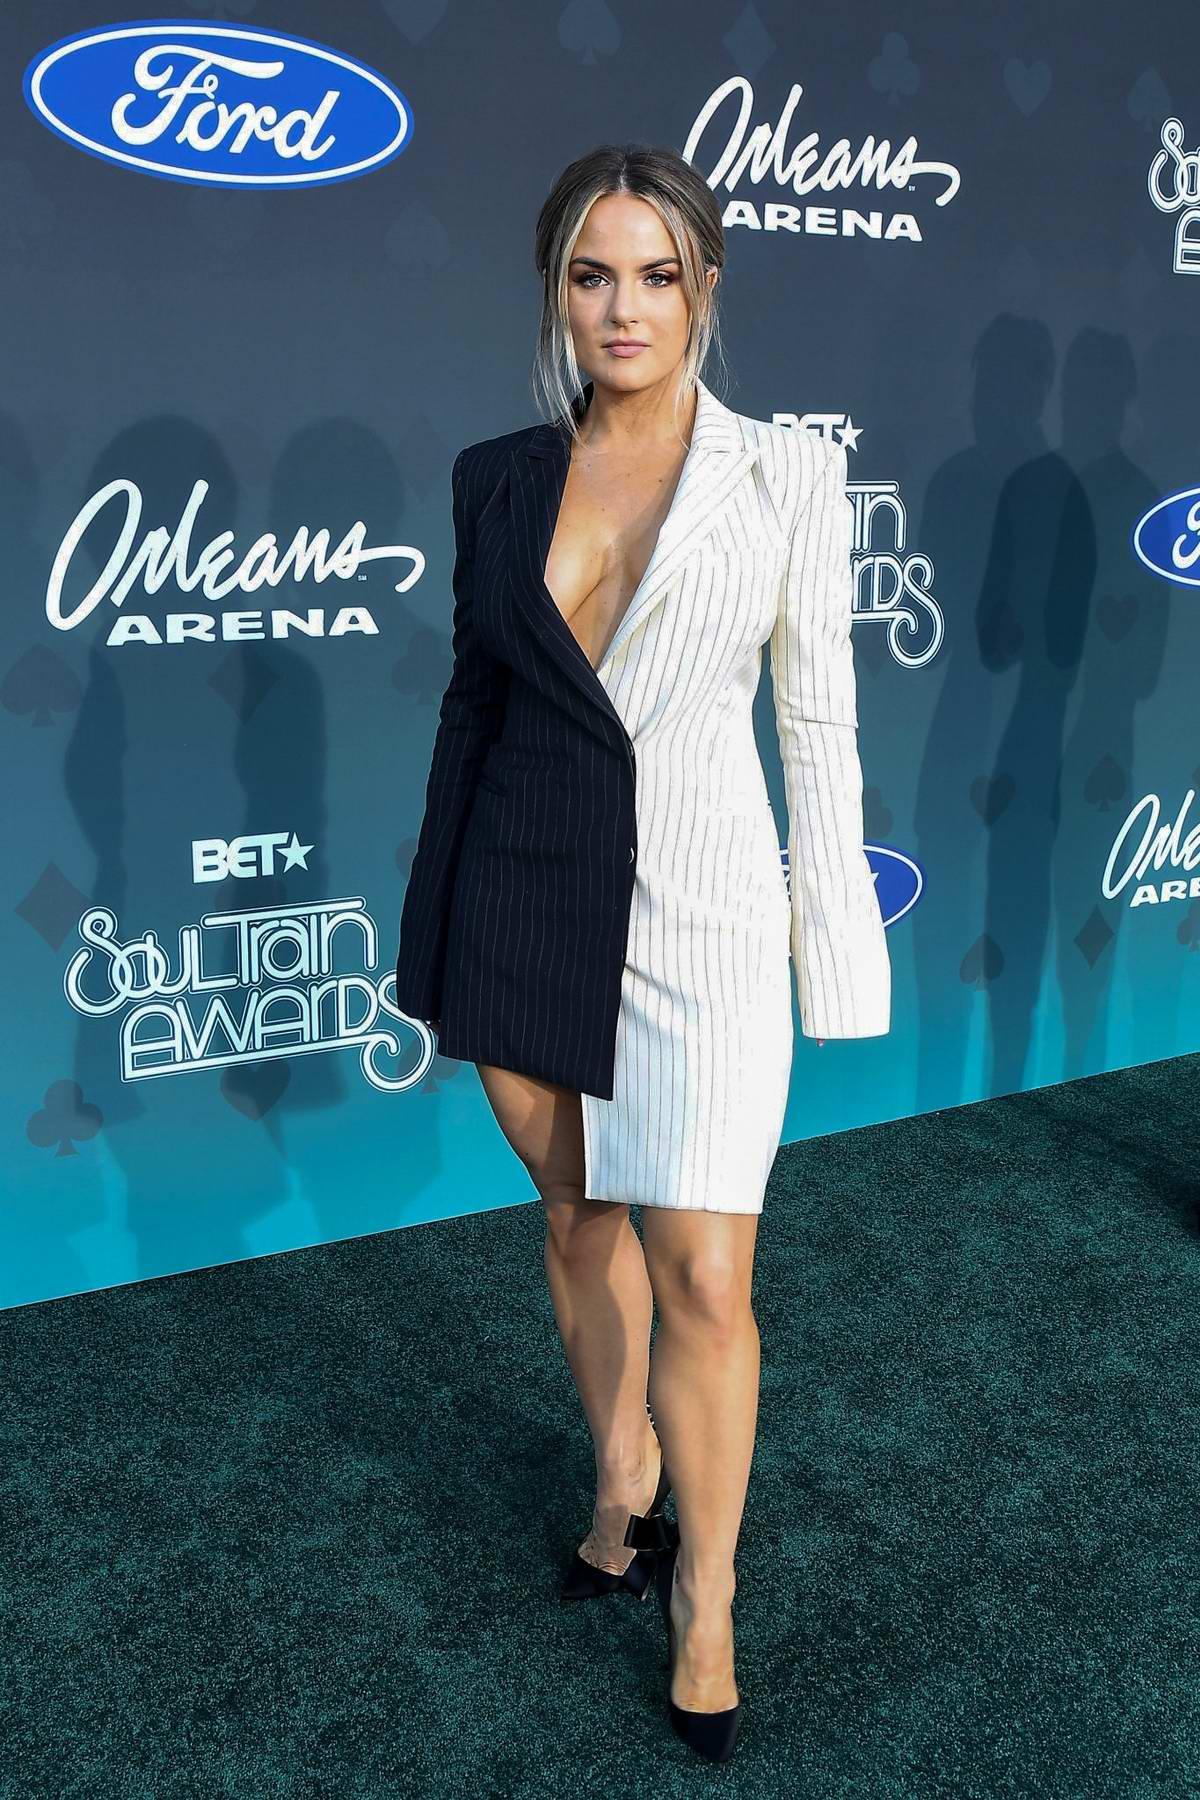 Joanna 'Jojo' Levesque attends the 2019 Soul Train Awards in Las Vegas, NV